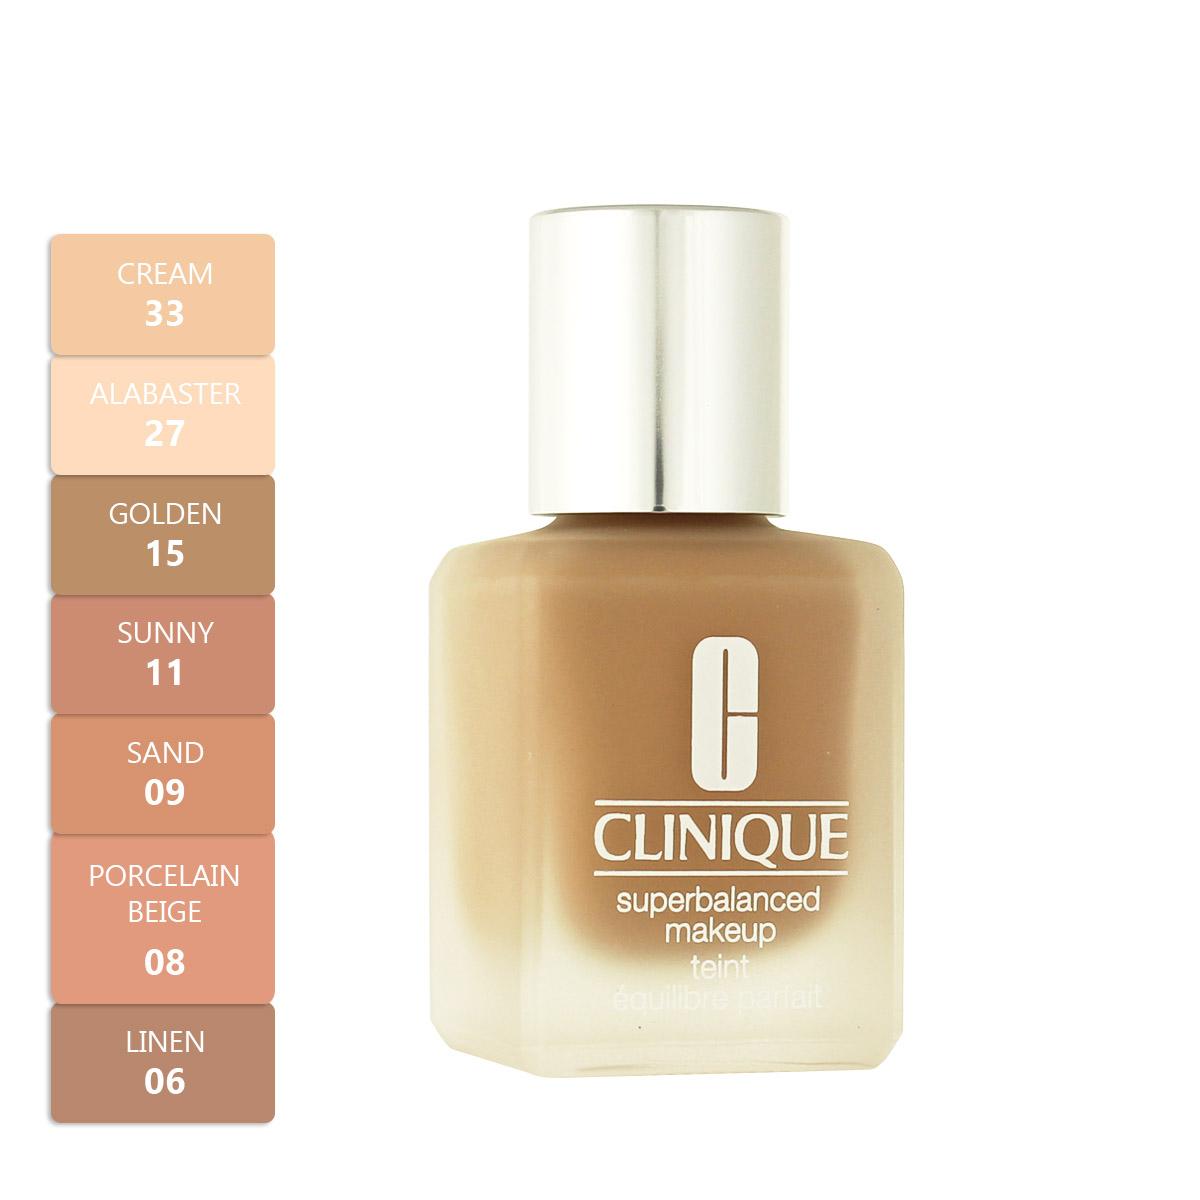 Clinique Superbalanced Makeup 30 ml